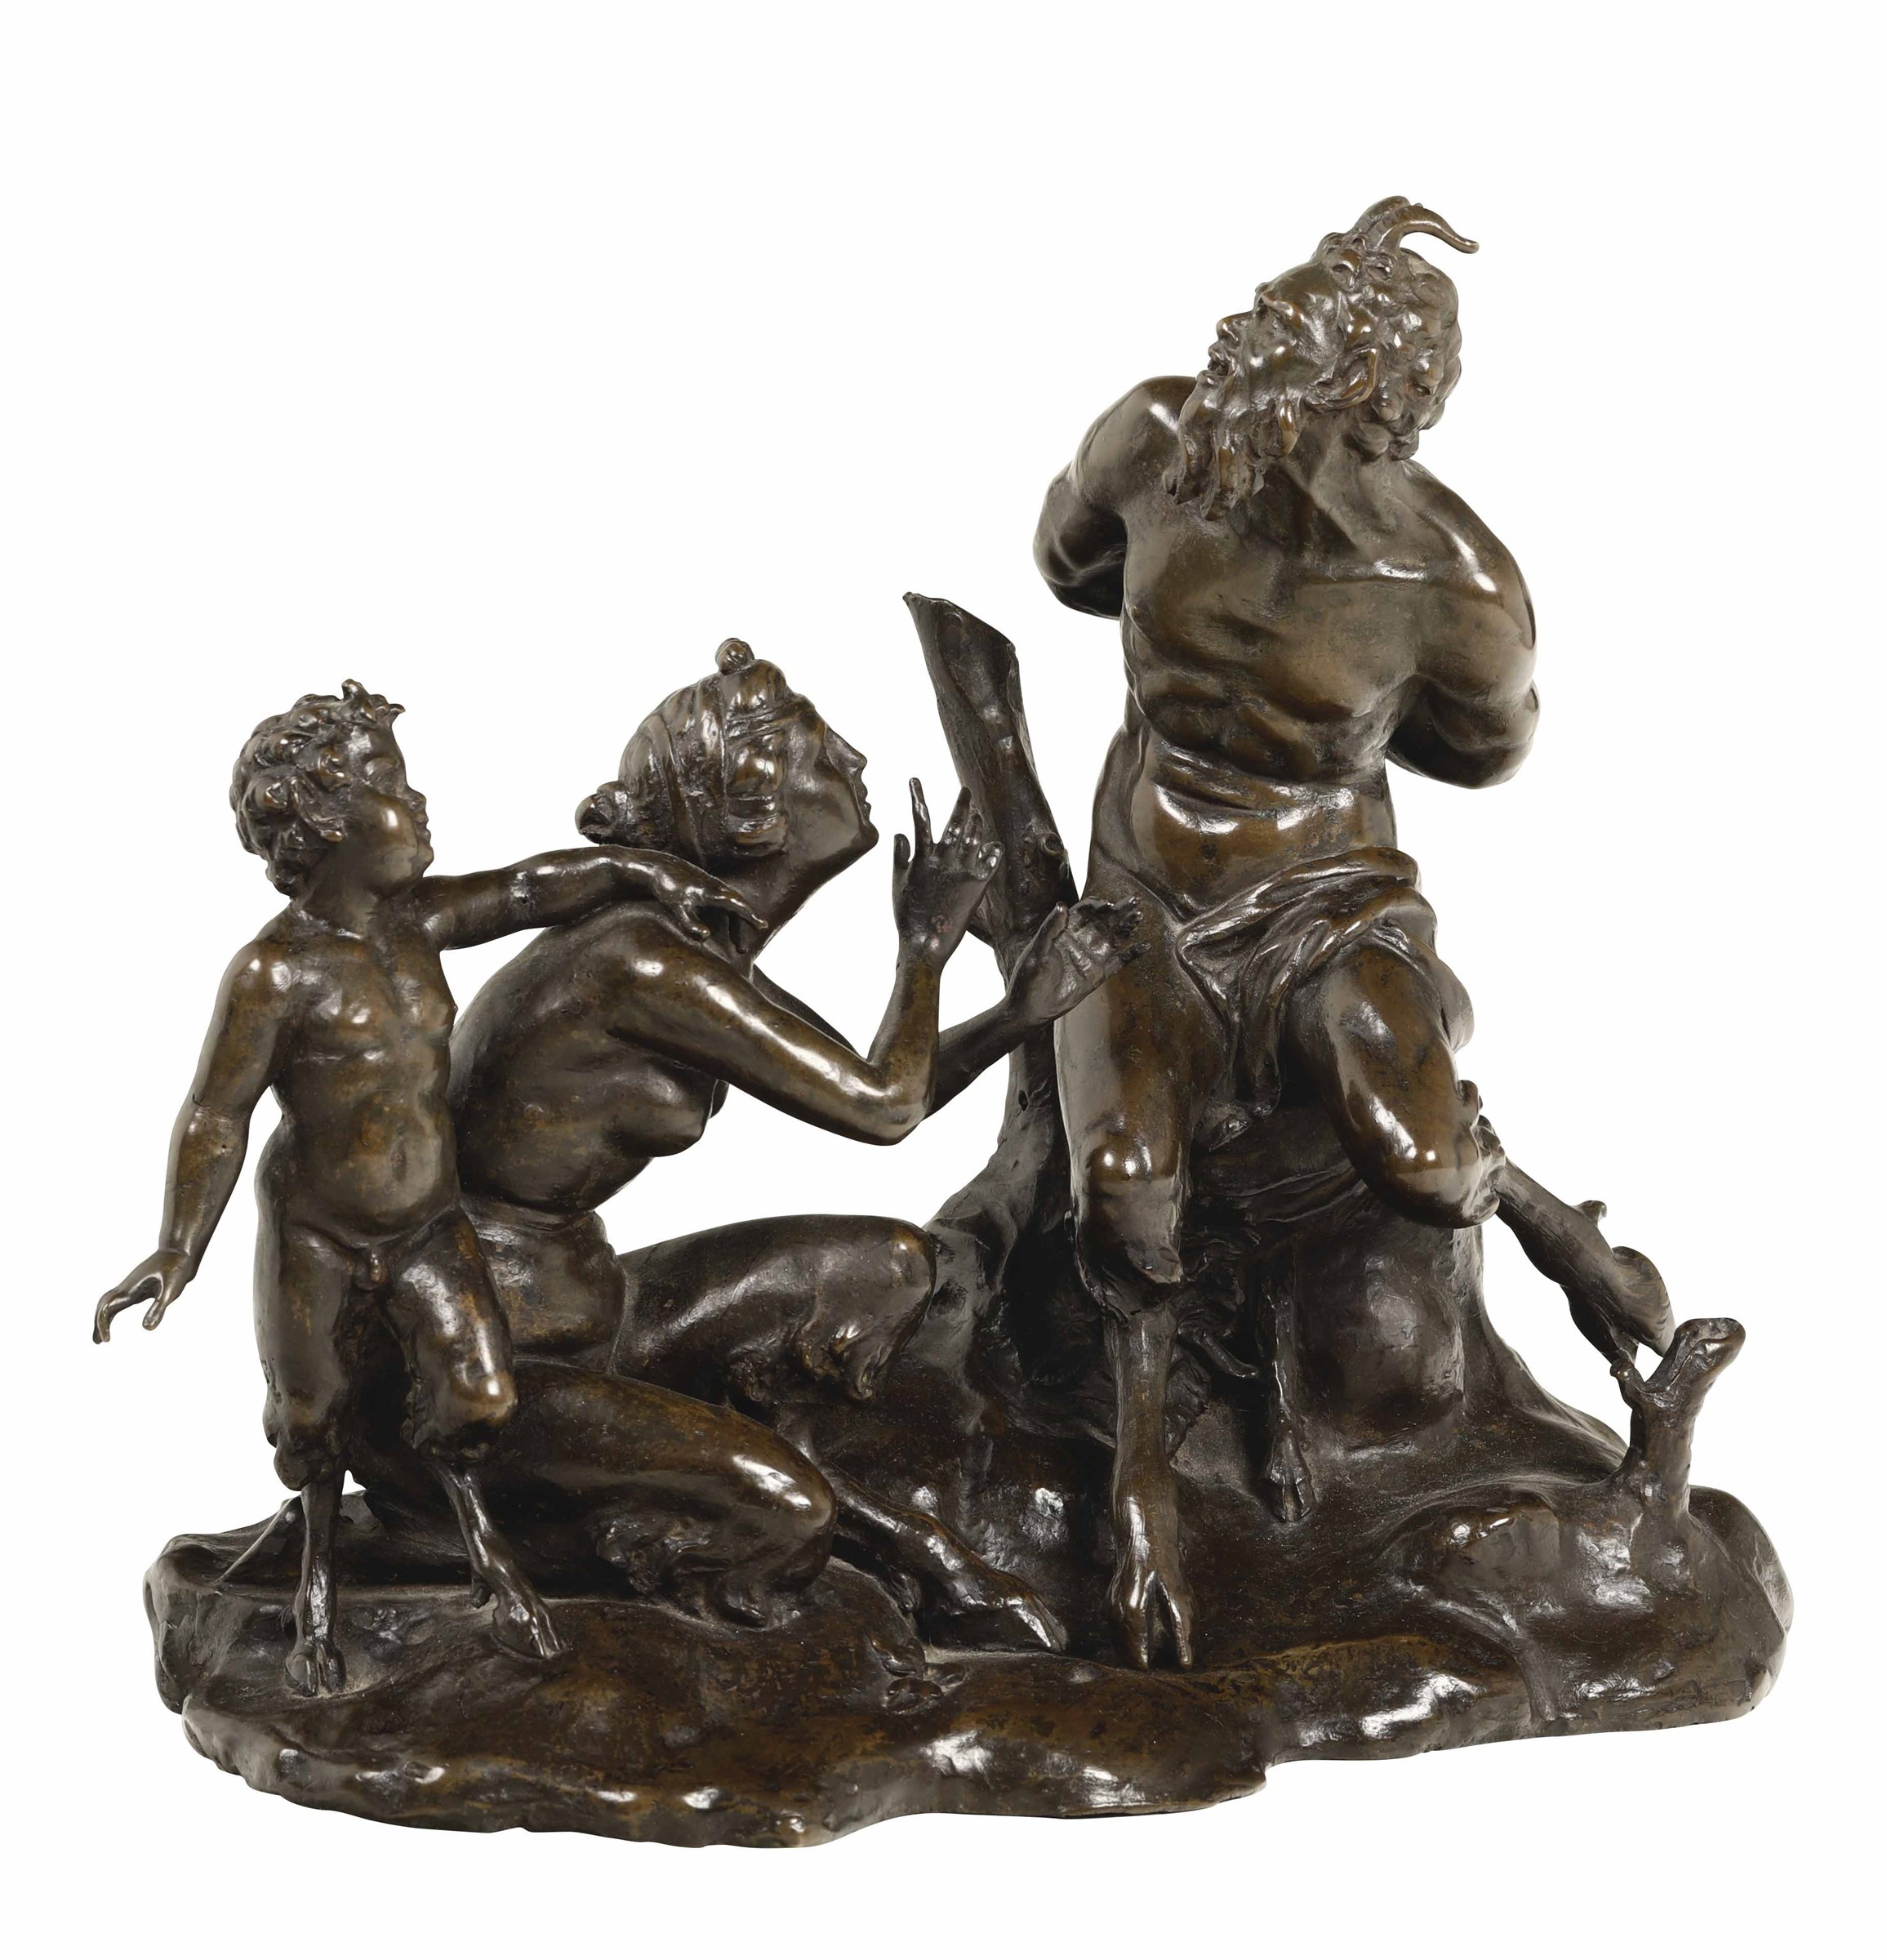 Lot 116 - Pan e Siringa. Bronzo fuso e cesellato, Francia (?) probabile XVII secolo, - cm [...]